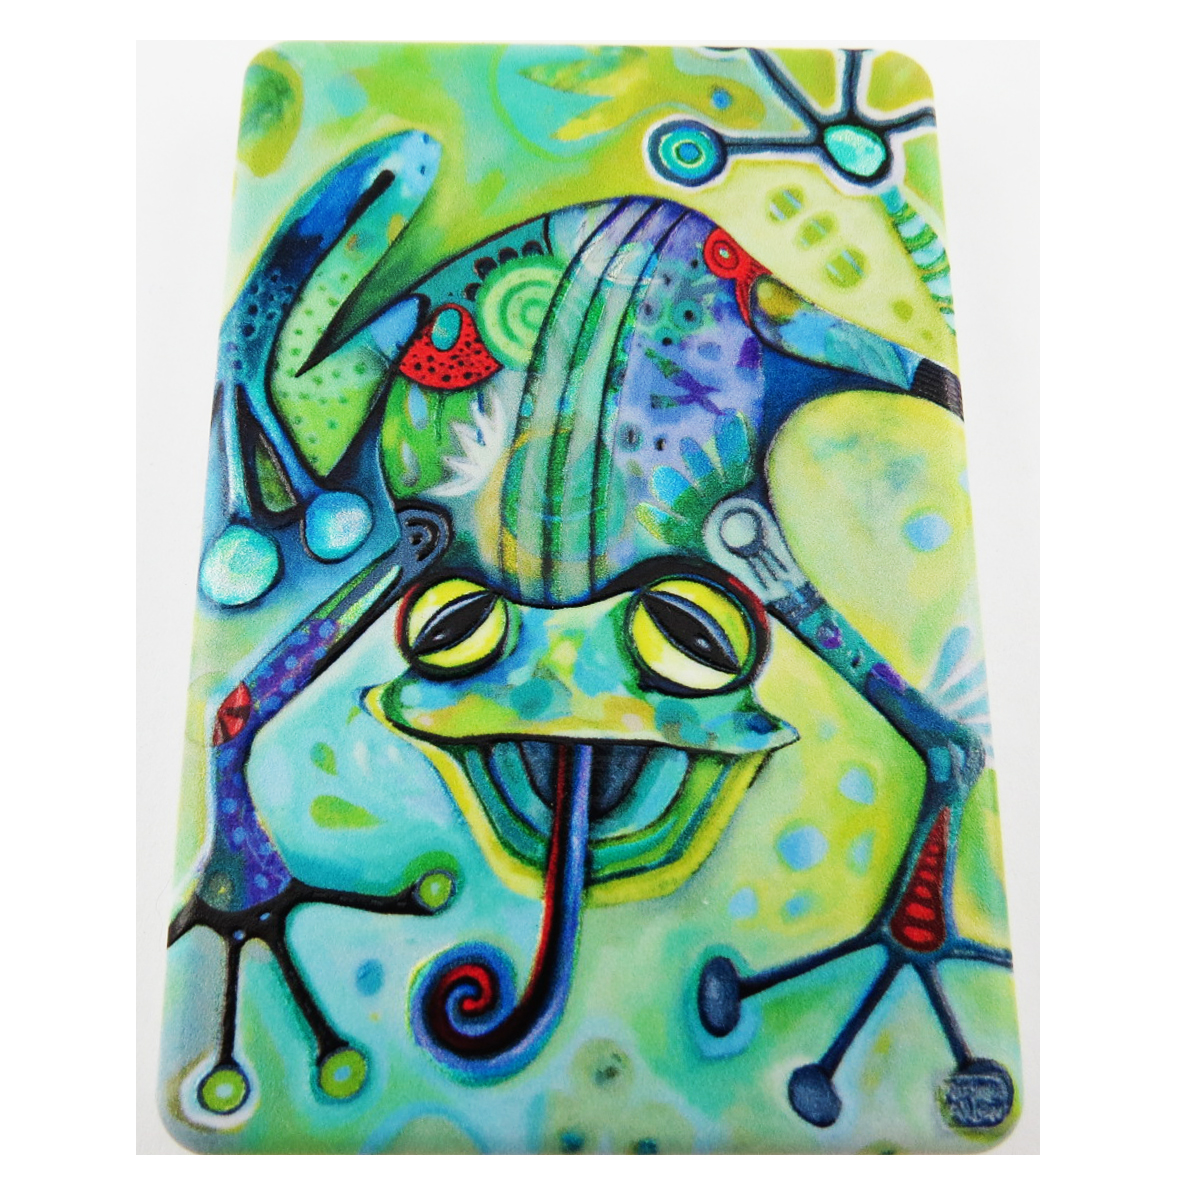 Miroir de poche \'Allen Designs\' vert (grenouille) - 85x55 cm - [R1977]